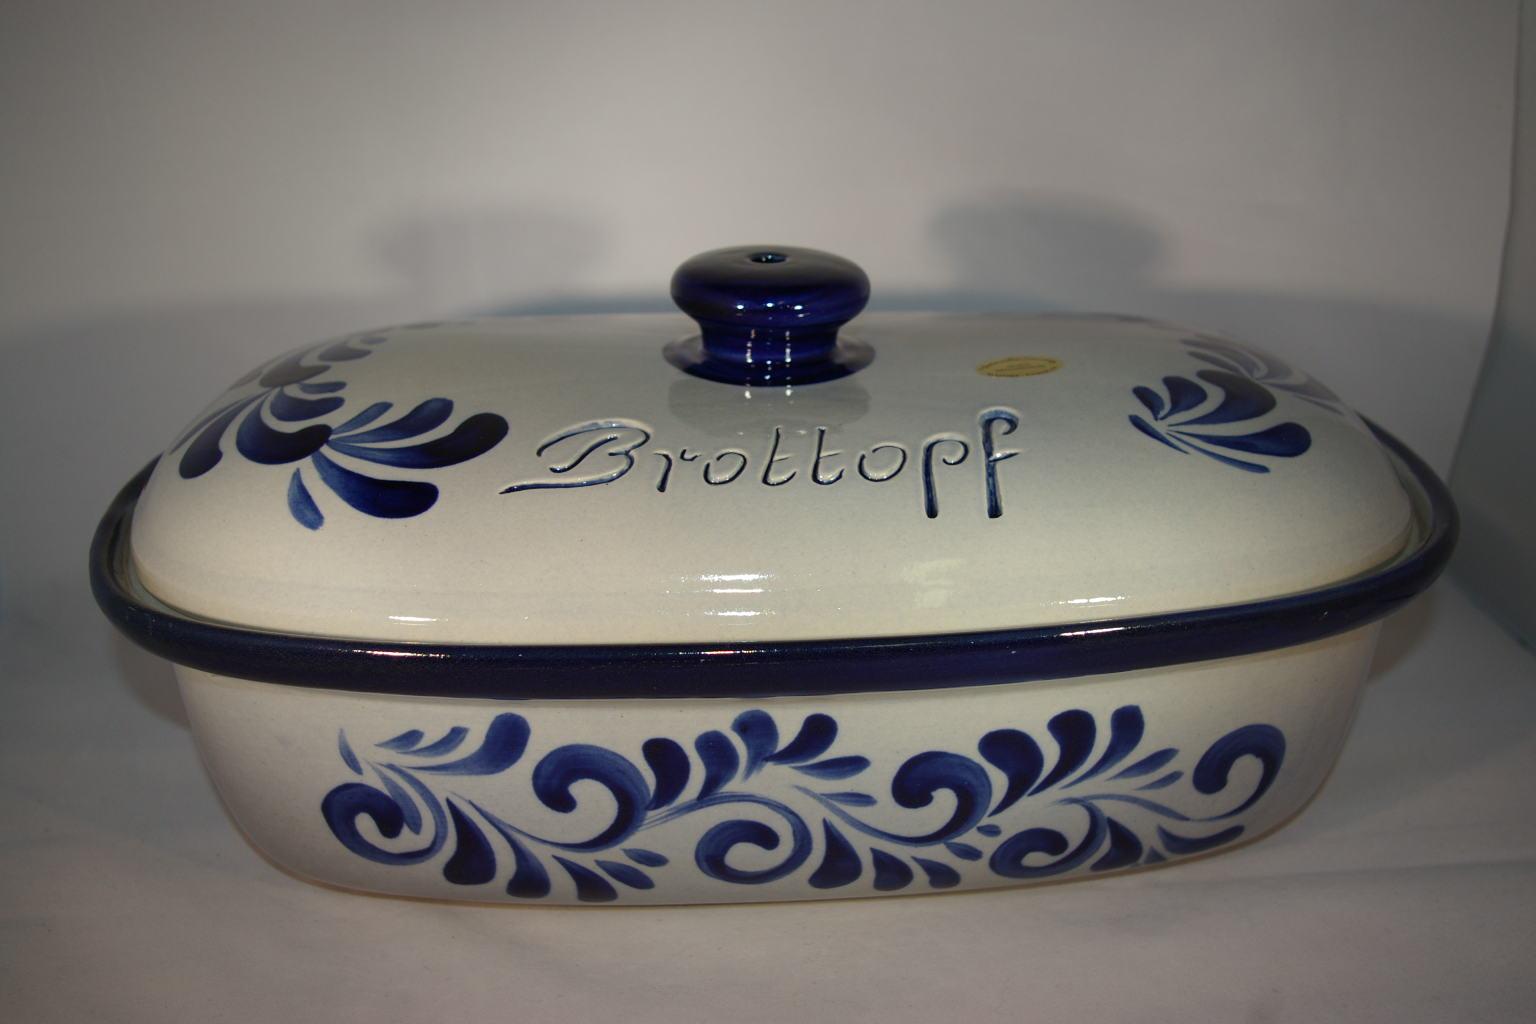 brottopf 40 cm grau blau bembel shop keramik seifert. Black Bedroom Furniture Sets. Home Design Ideas